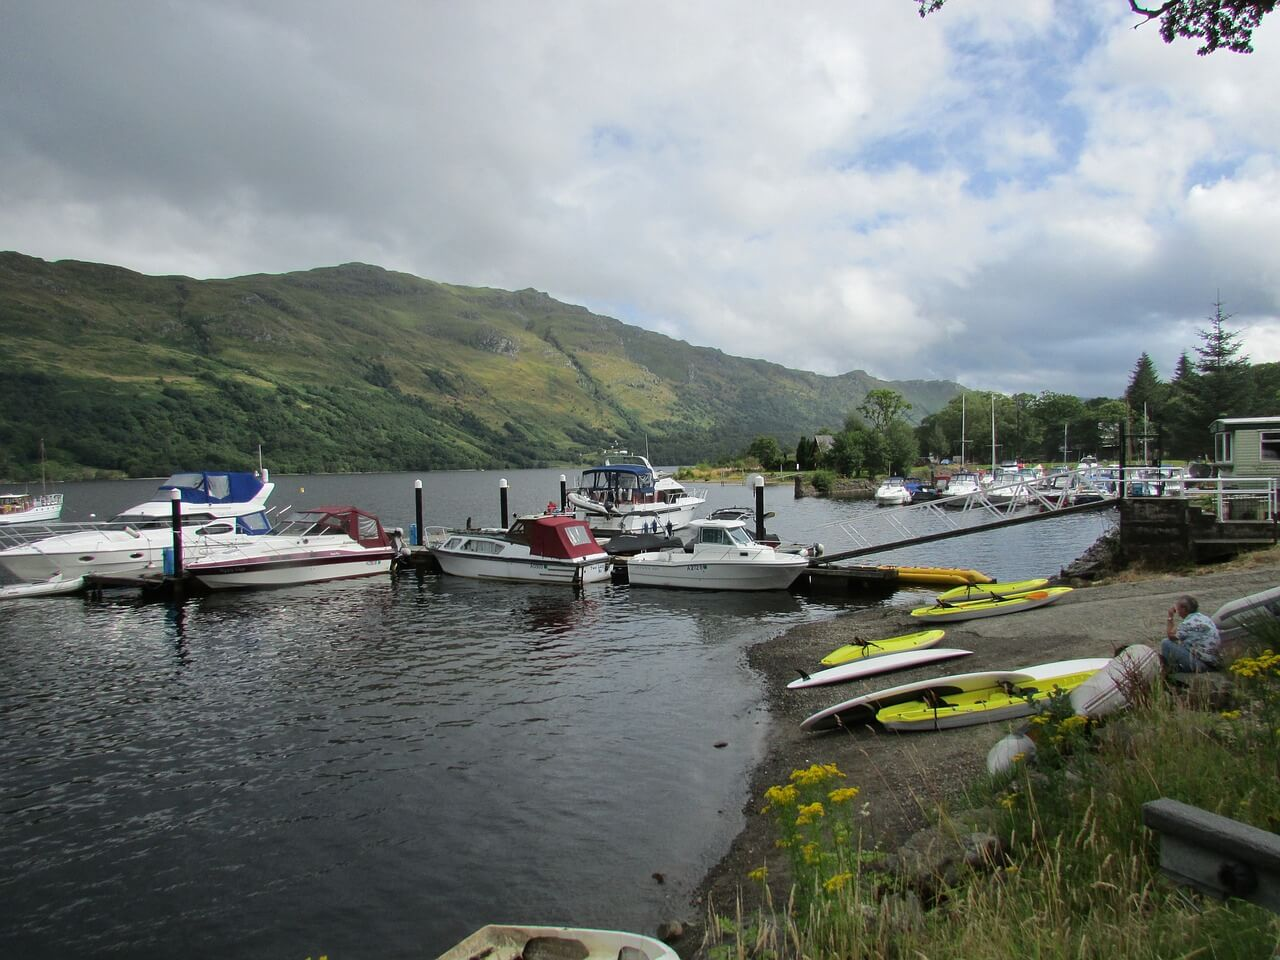 scotland-407274_1280.jpg